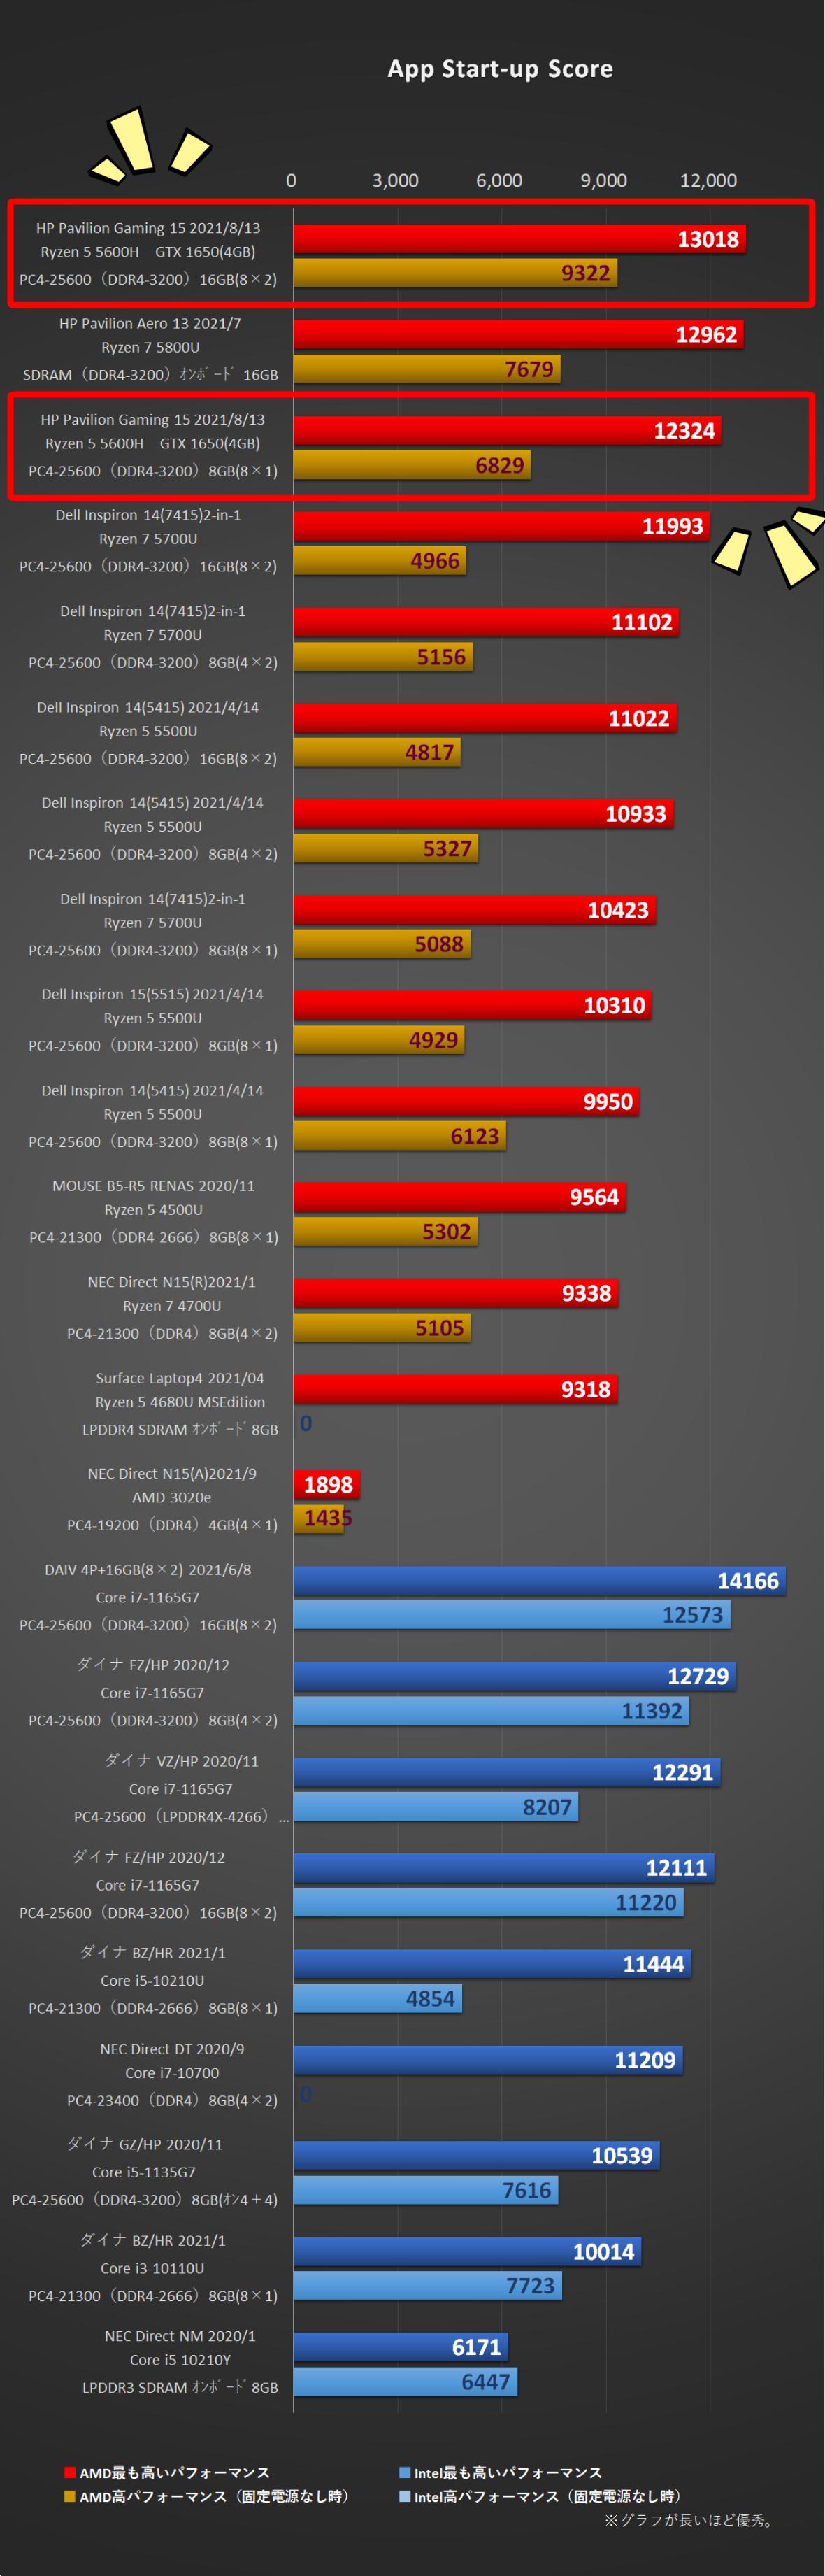 「HP Pavilion Gaming 15(AMD)2021年モデル」App Start-up Score比較グラフ